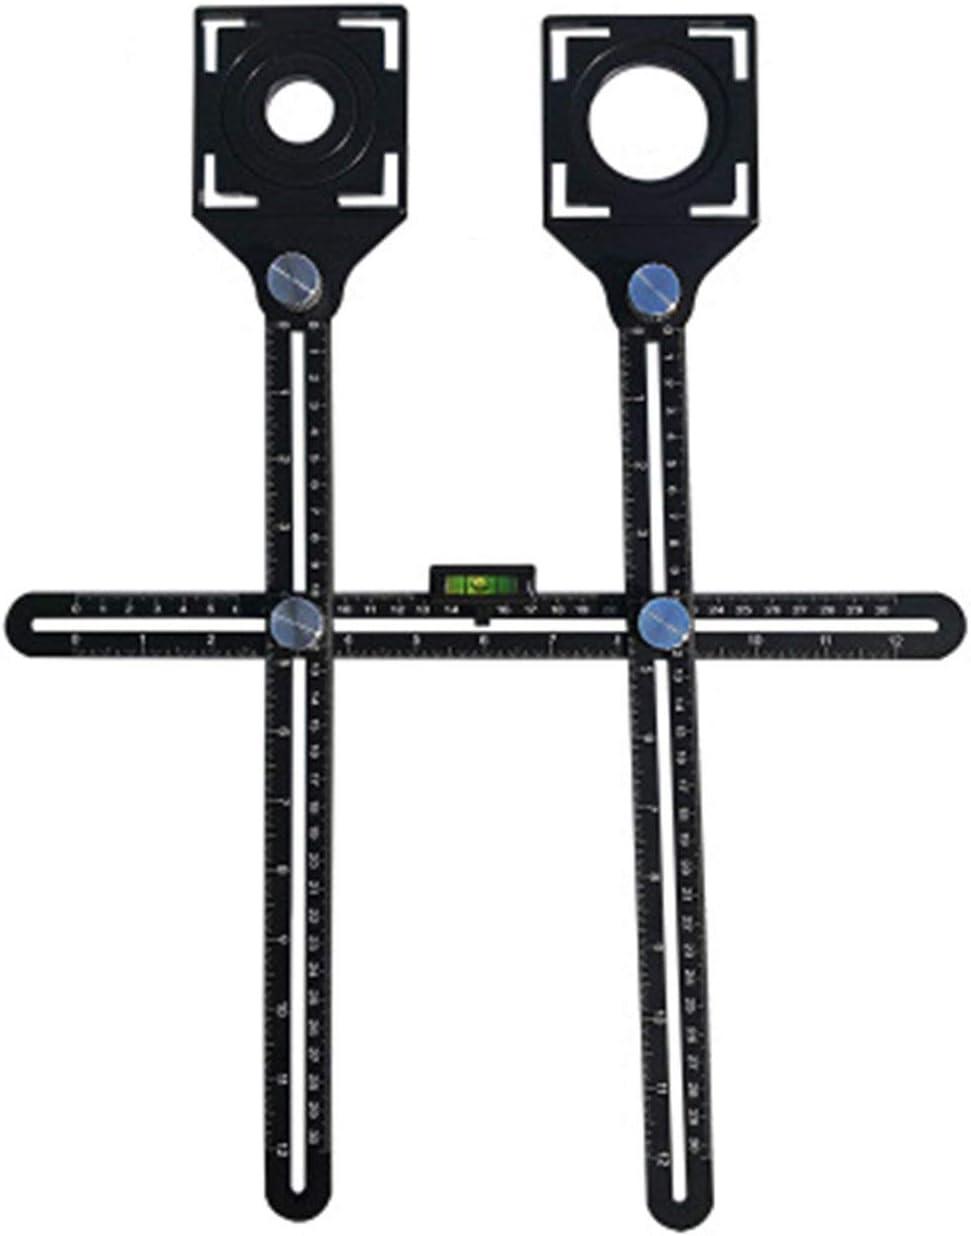 Regla plegable de doble cabeza Localizador de orificios para baldosas Herramienta de mano perforada fija de vidrio de mampostería universal ajustable - Negro